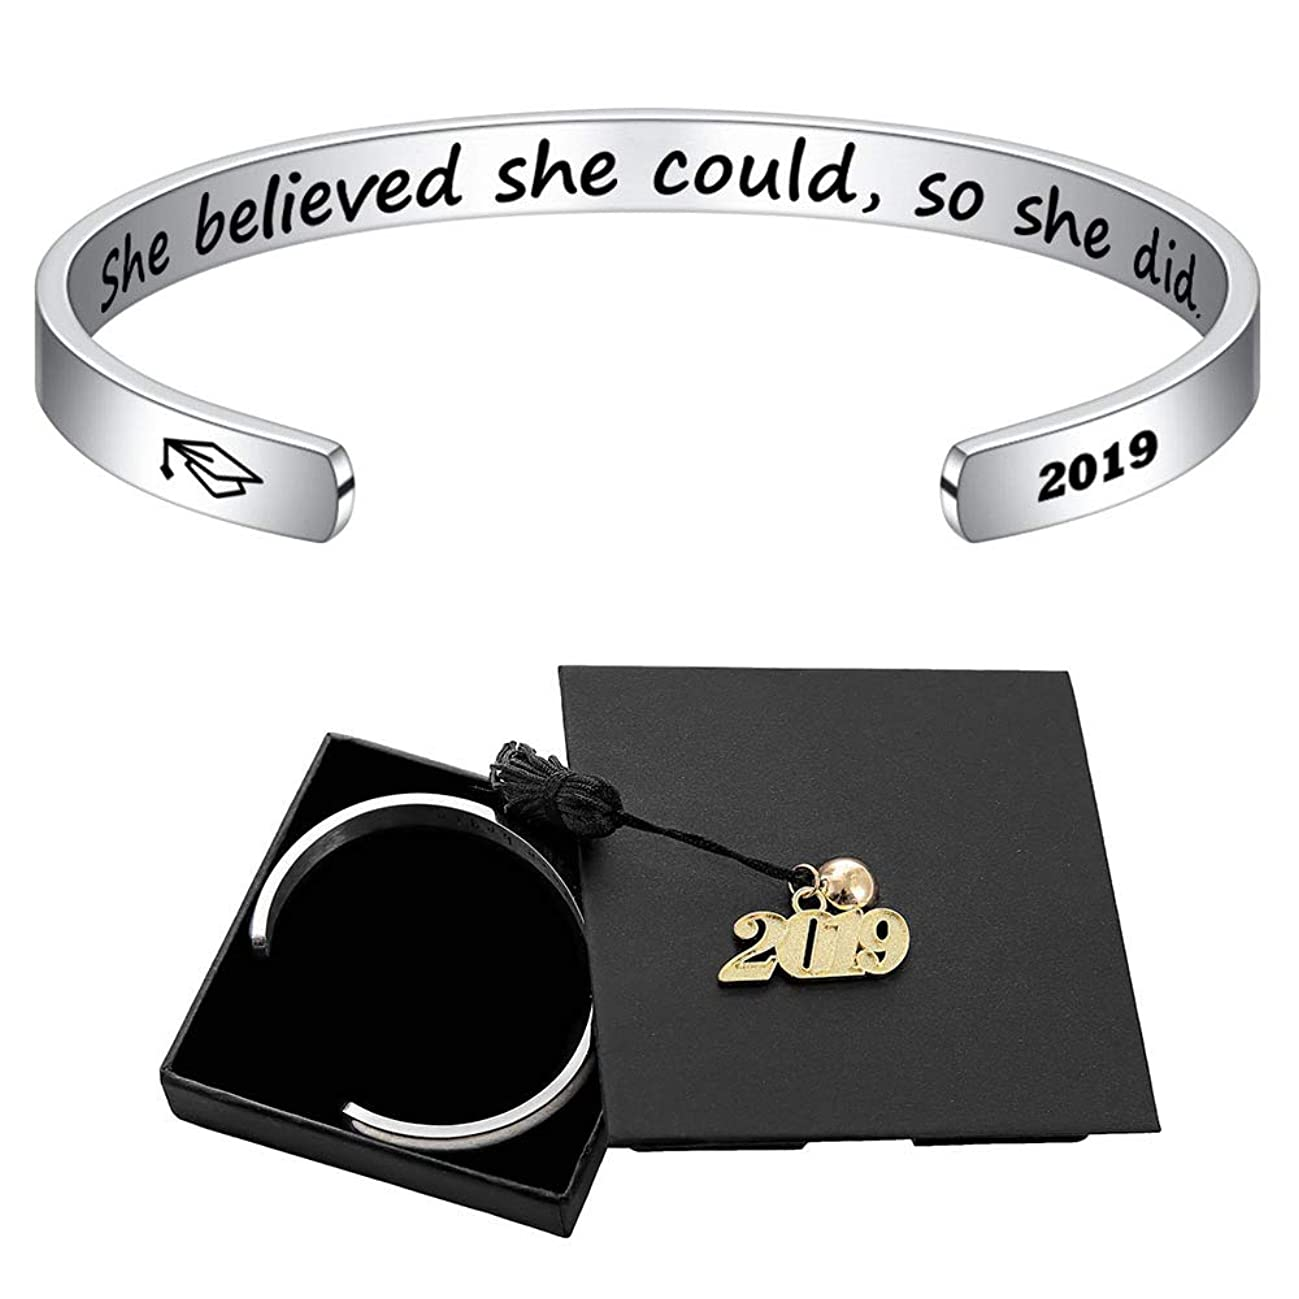 M MOOHAM Inspirational Graduation Gifts Cuff Bracelet - Engraved Inspirational Bracelet Cuff Bangle with 2019 Graduation Grad Cap, Mantra Quote Keep Going Bracelet Graduation Friendship Gifts for Her